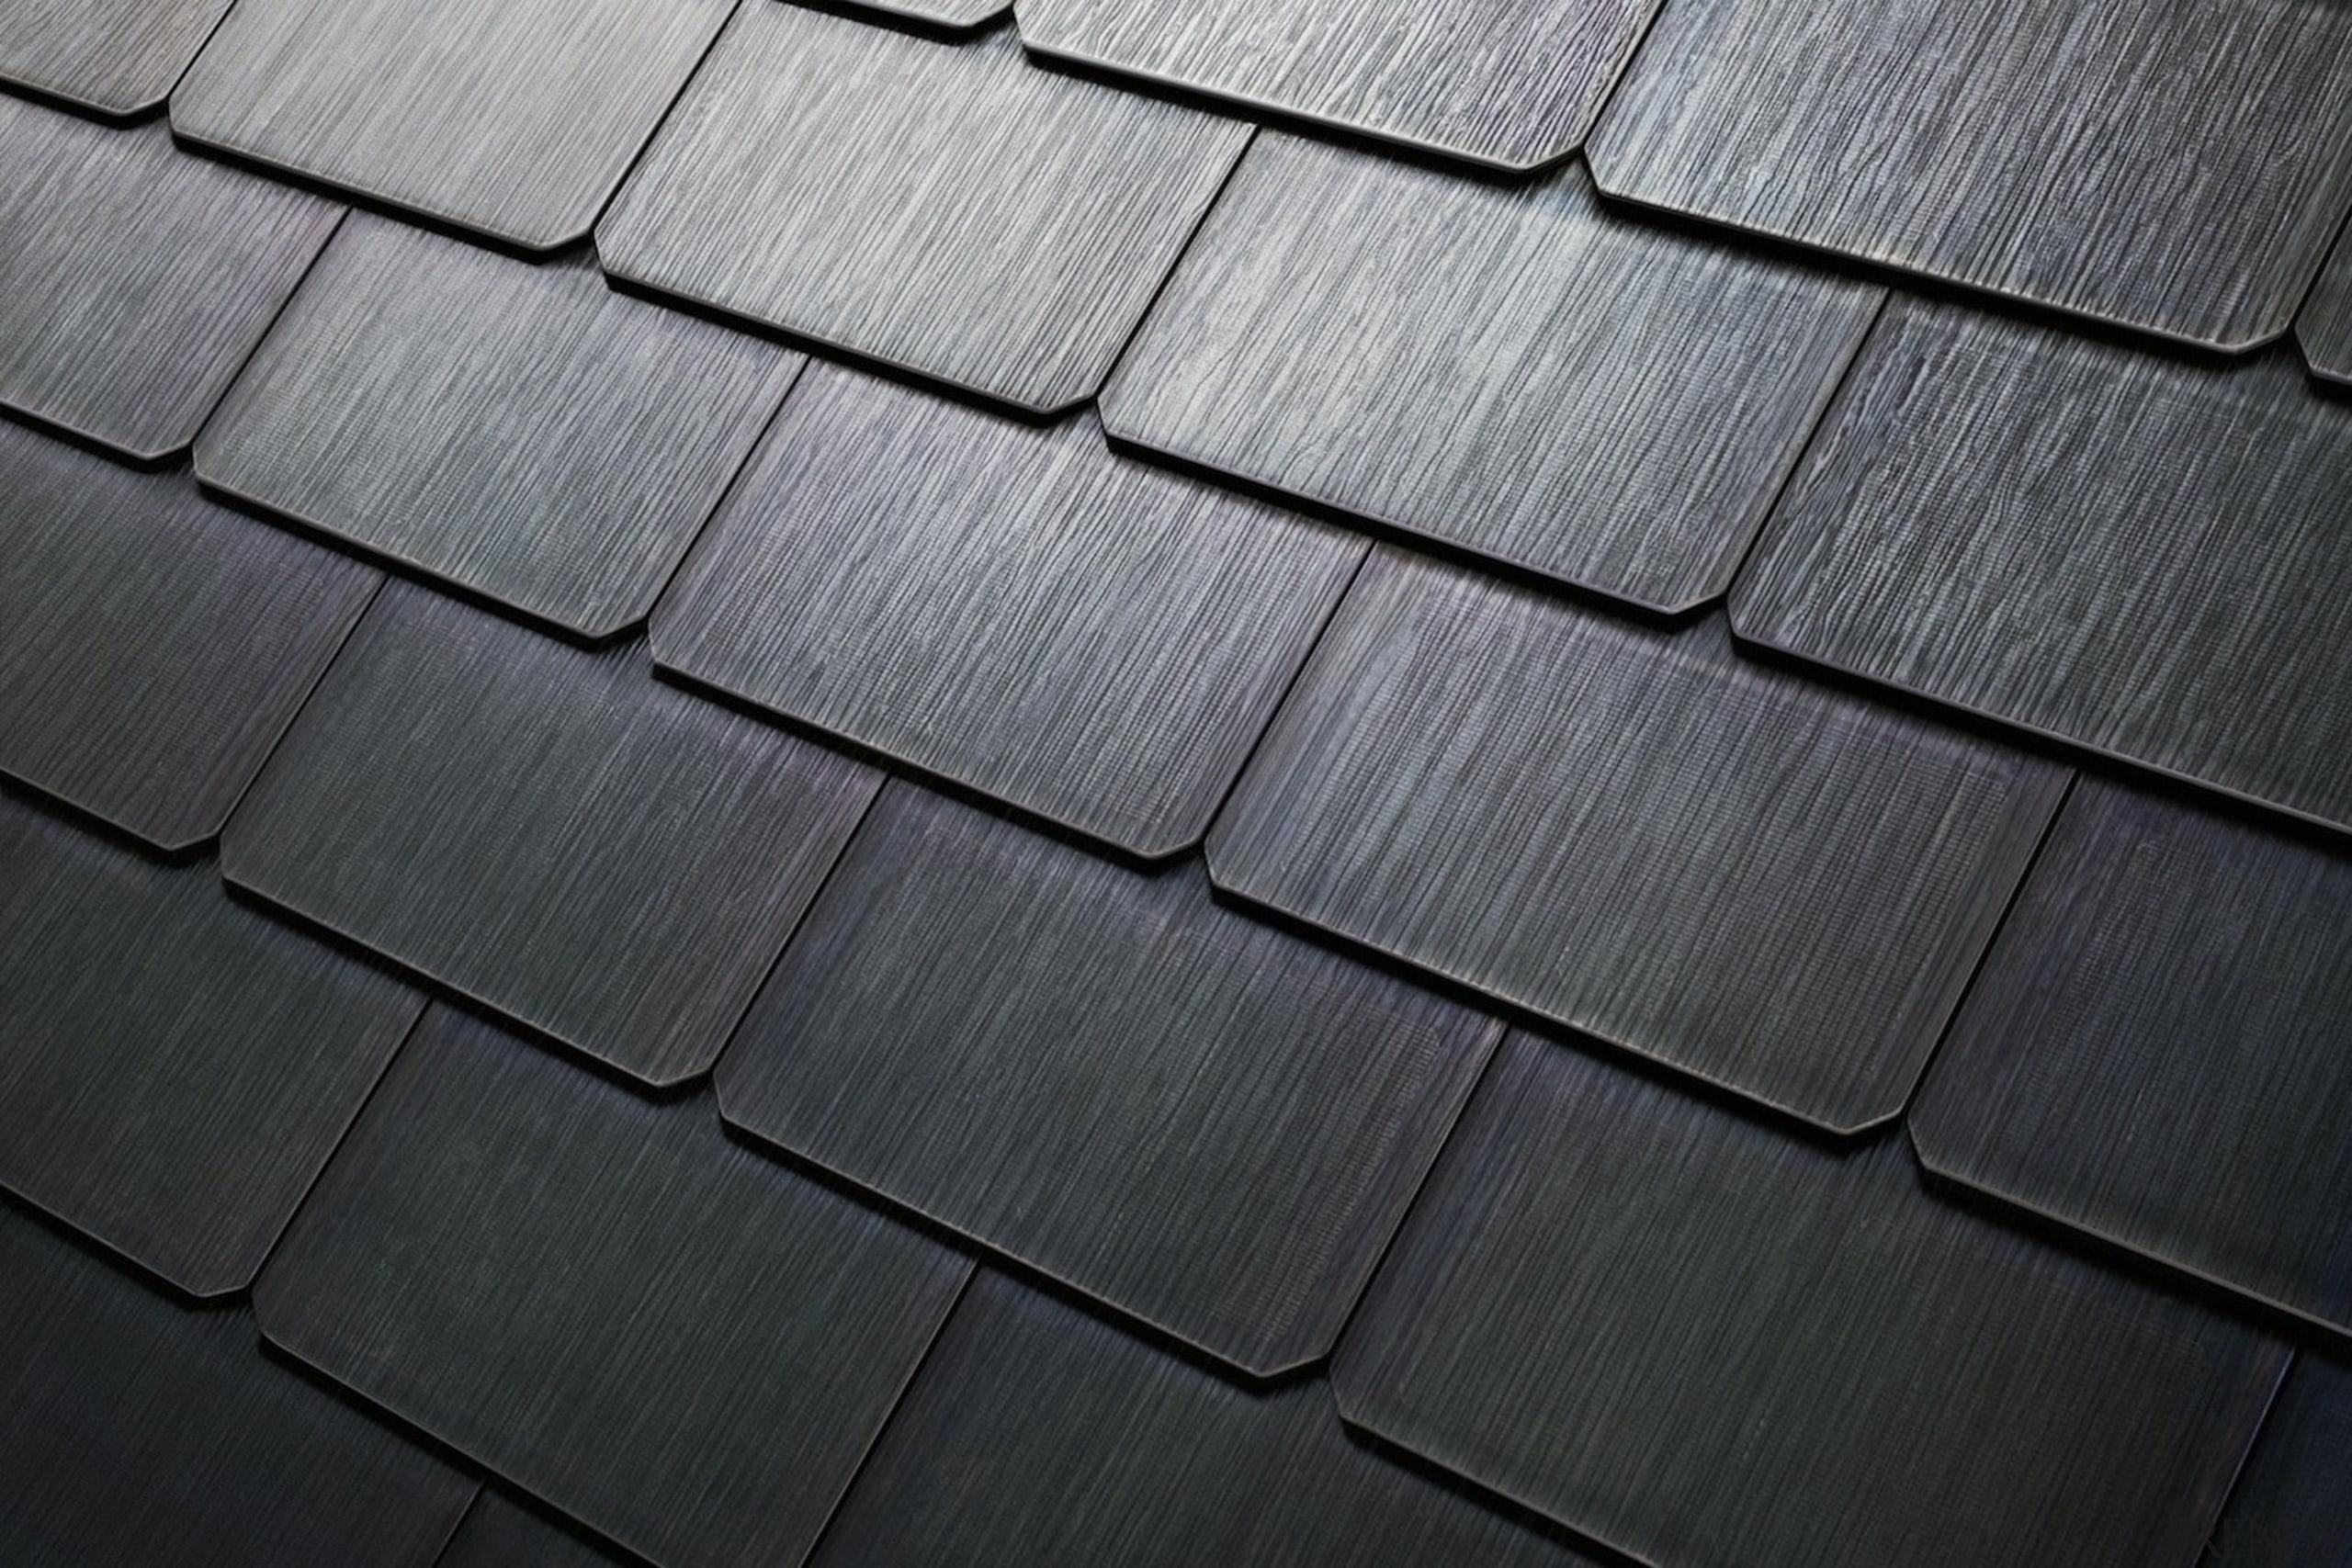 Tesla Solar Roof tiles - Tesla Solar Roof angle, black, daylighting, line, material, road surface, slate, texture, wood, black, gray